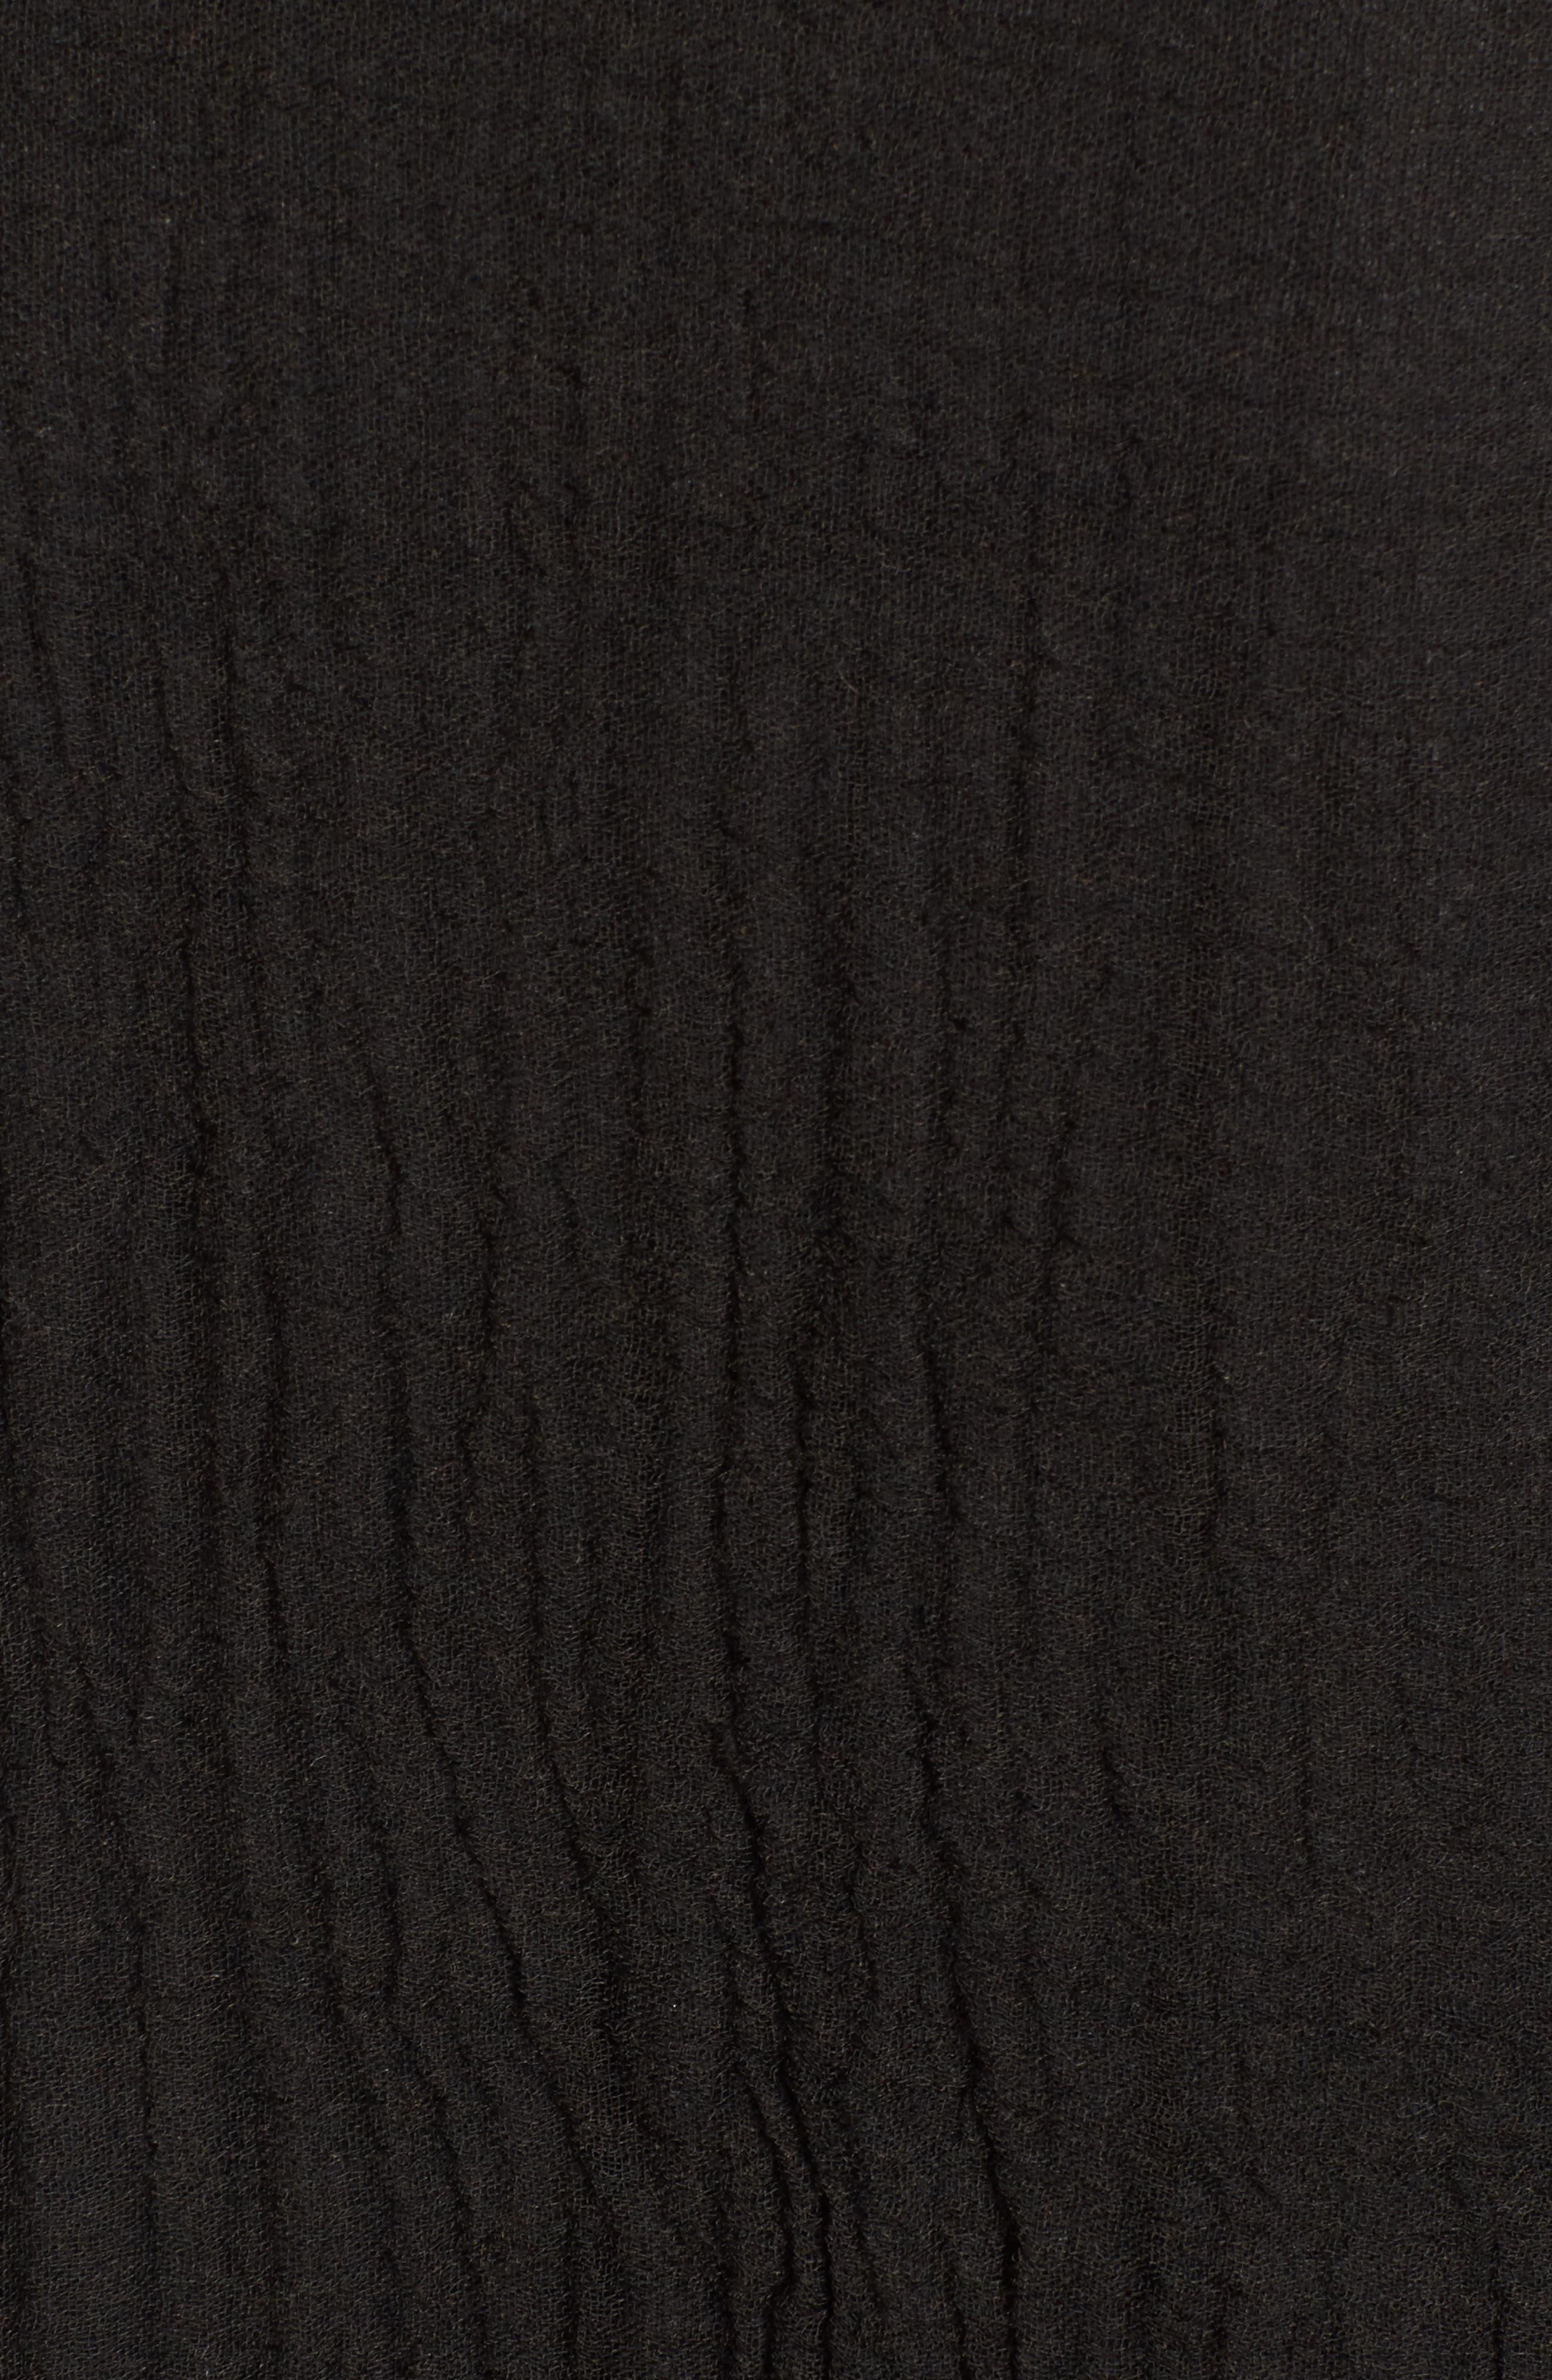 Tassel Wrap,                             Alternate thumbnail 5, color,                             BLACK